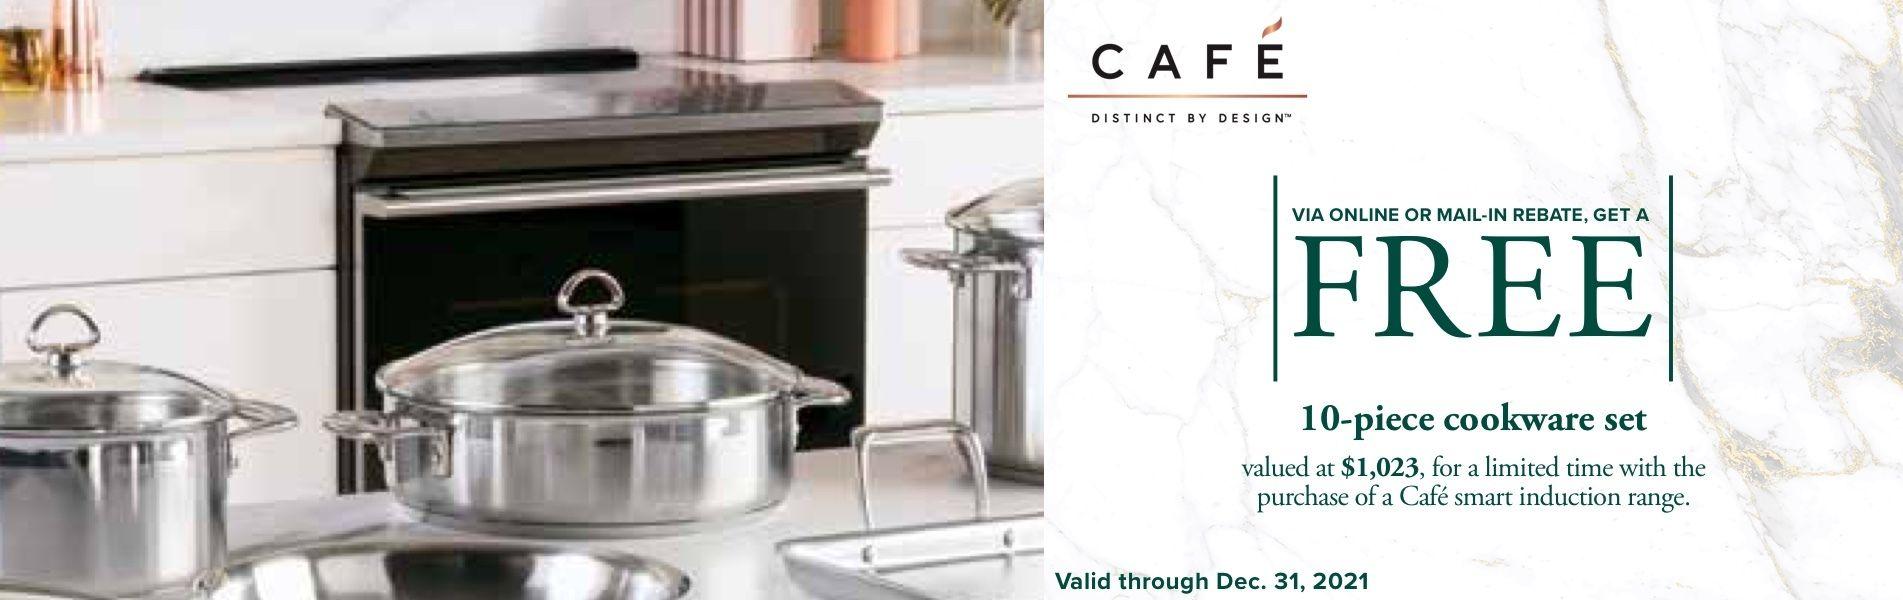 Cafe - Free 10 Piece Kitchenware Set